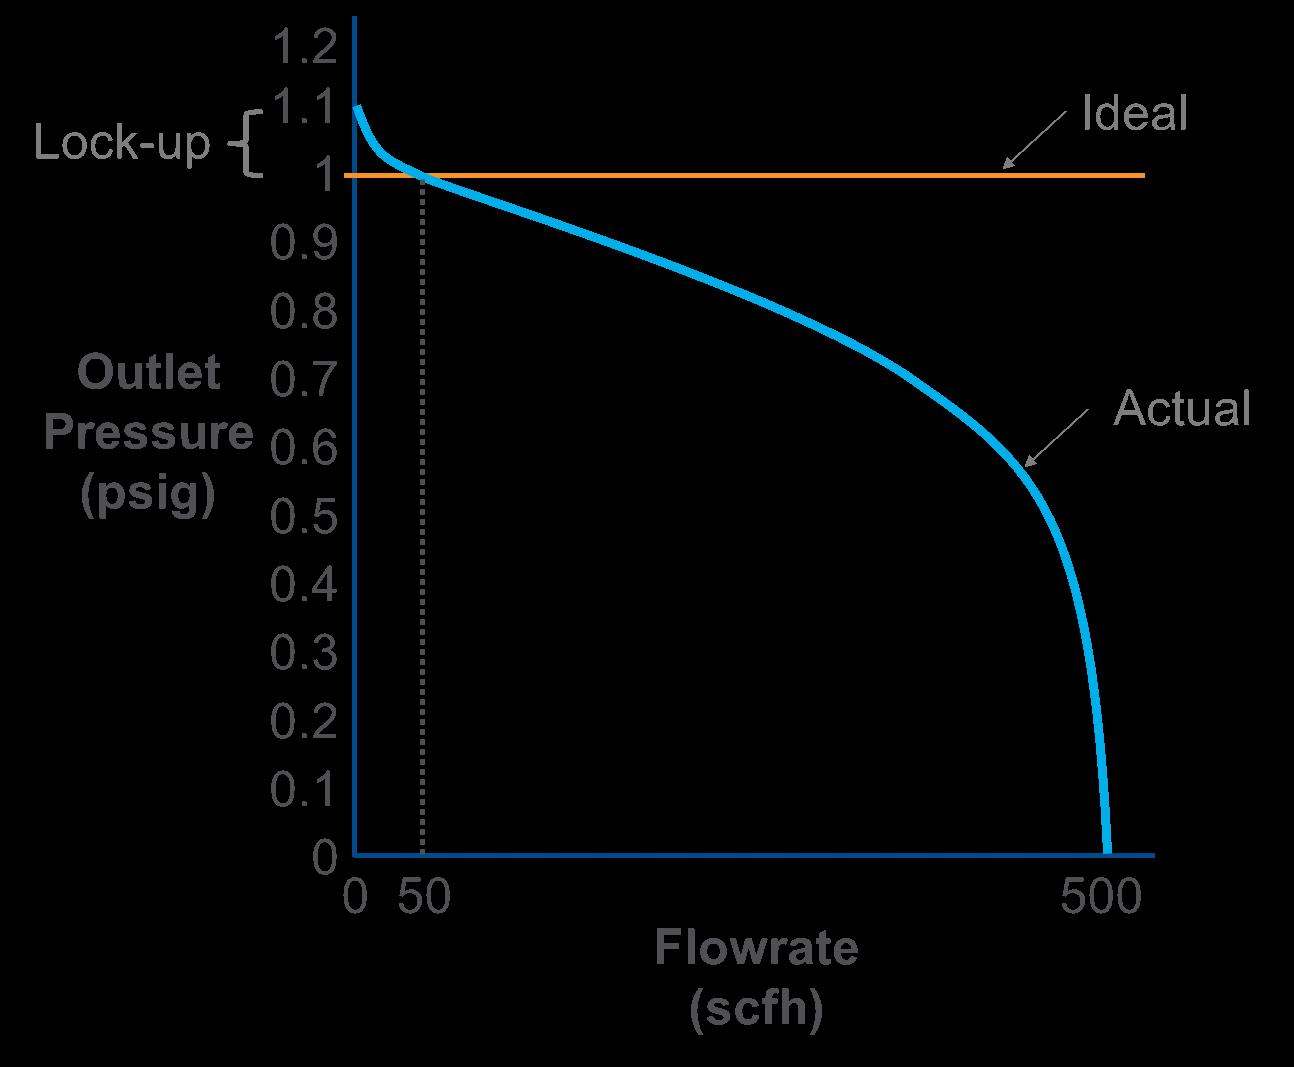 1-lockup-performance-curve.png